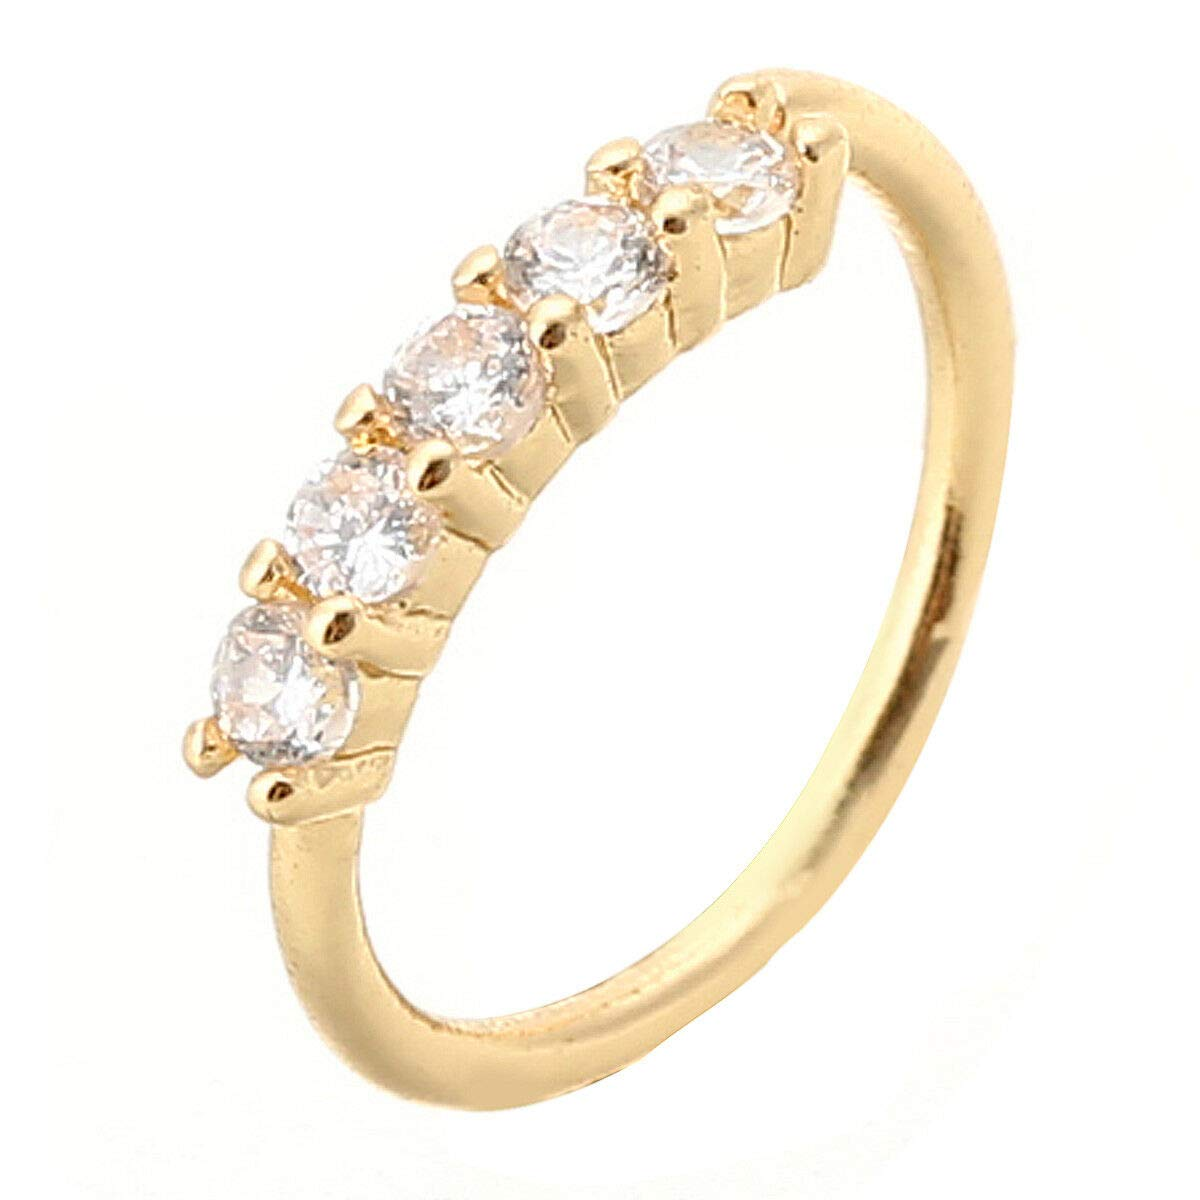 Nose Ring Ear Hoop Tragus Helix Cartilage Earrings Crystal Stainless Steel Gift